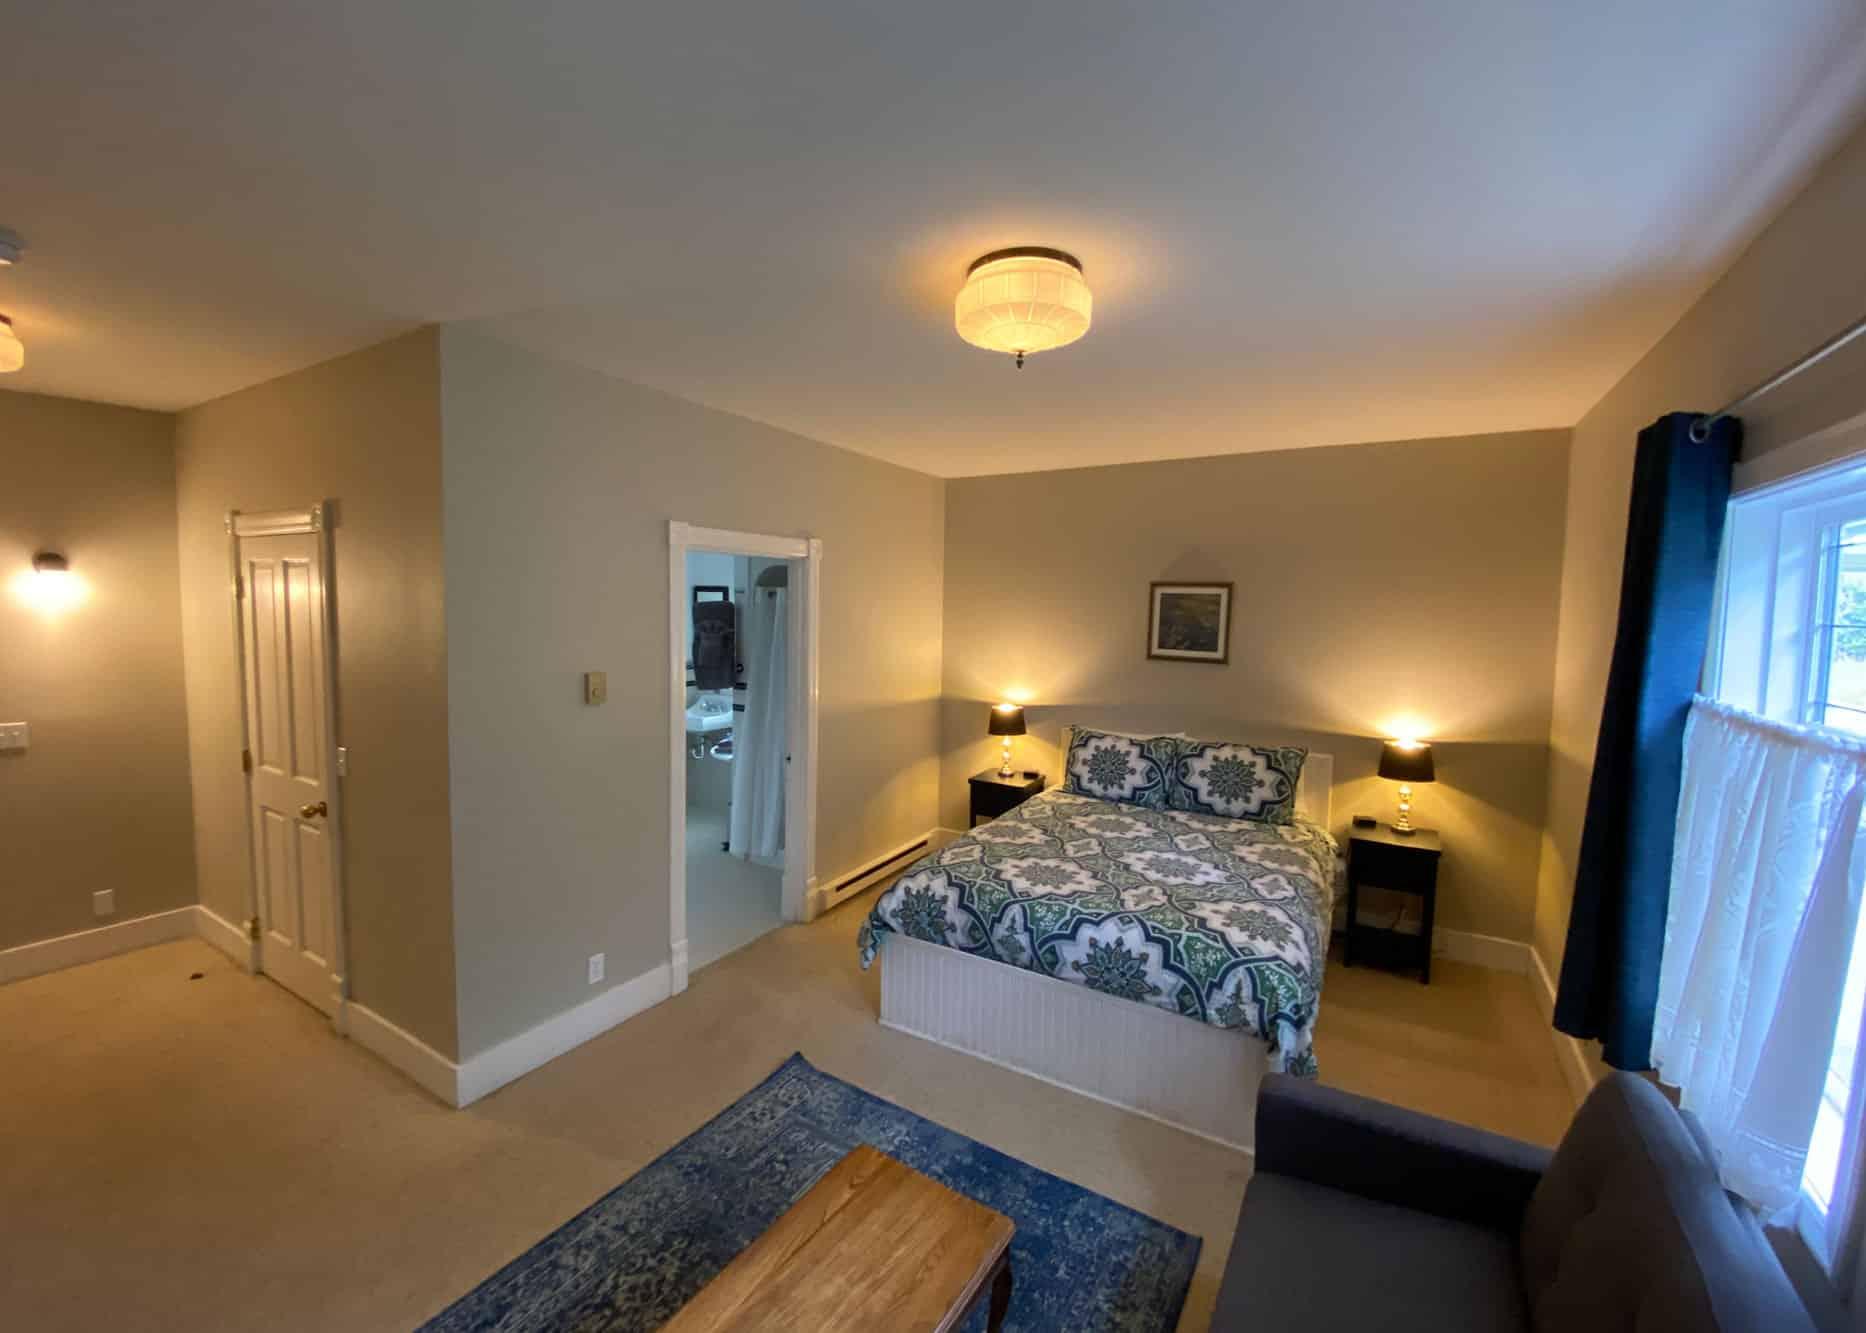 the-edenwild-inn-lopez-island-lodging-2020-room-03-01